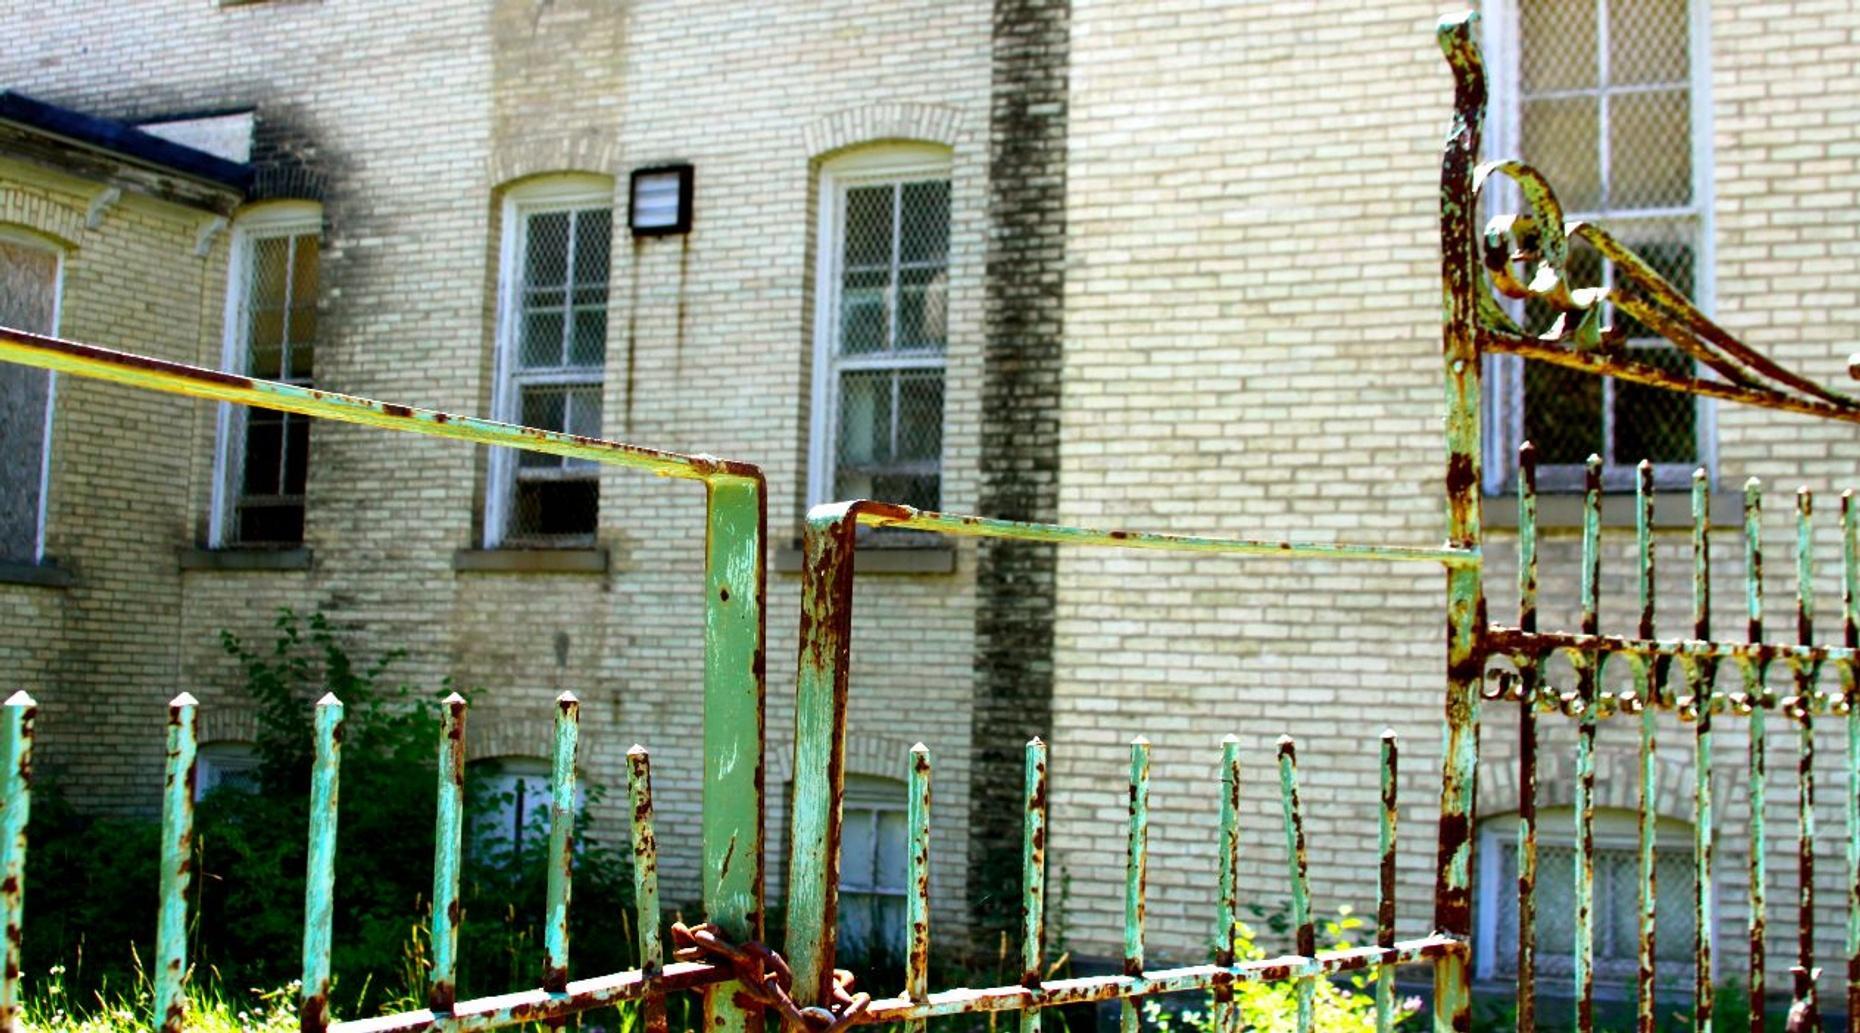 Traverse City Historic Asylum Photography Tour